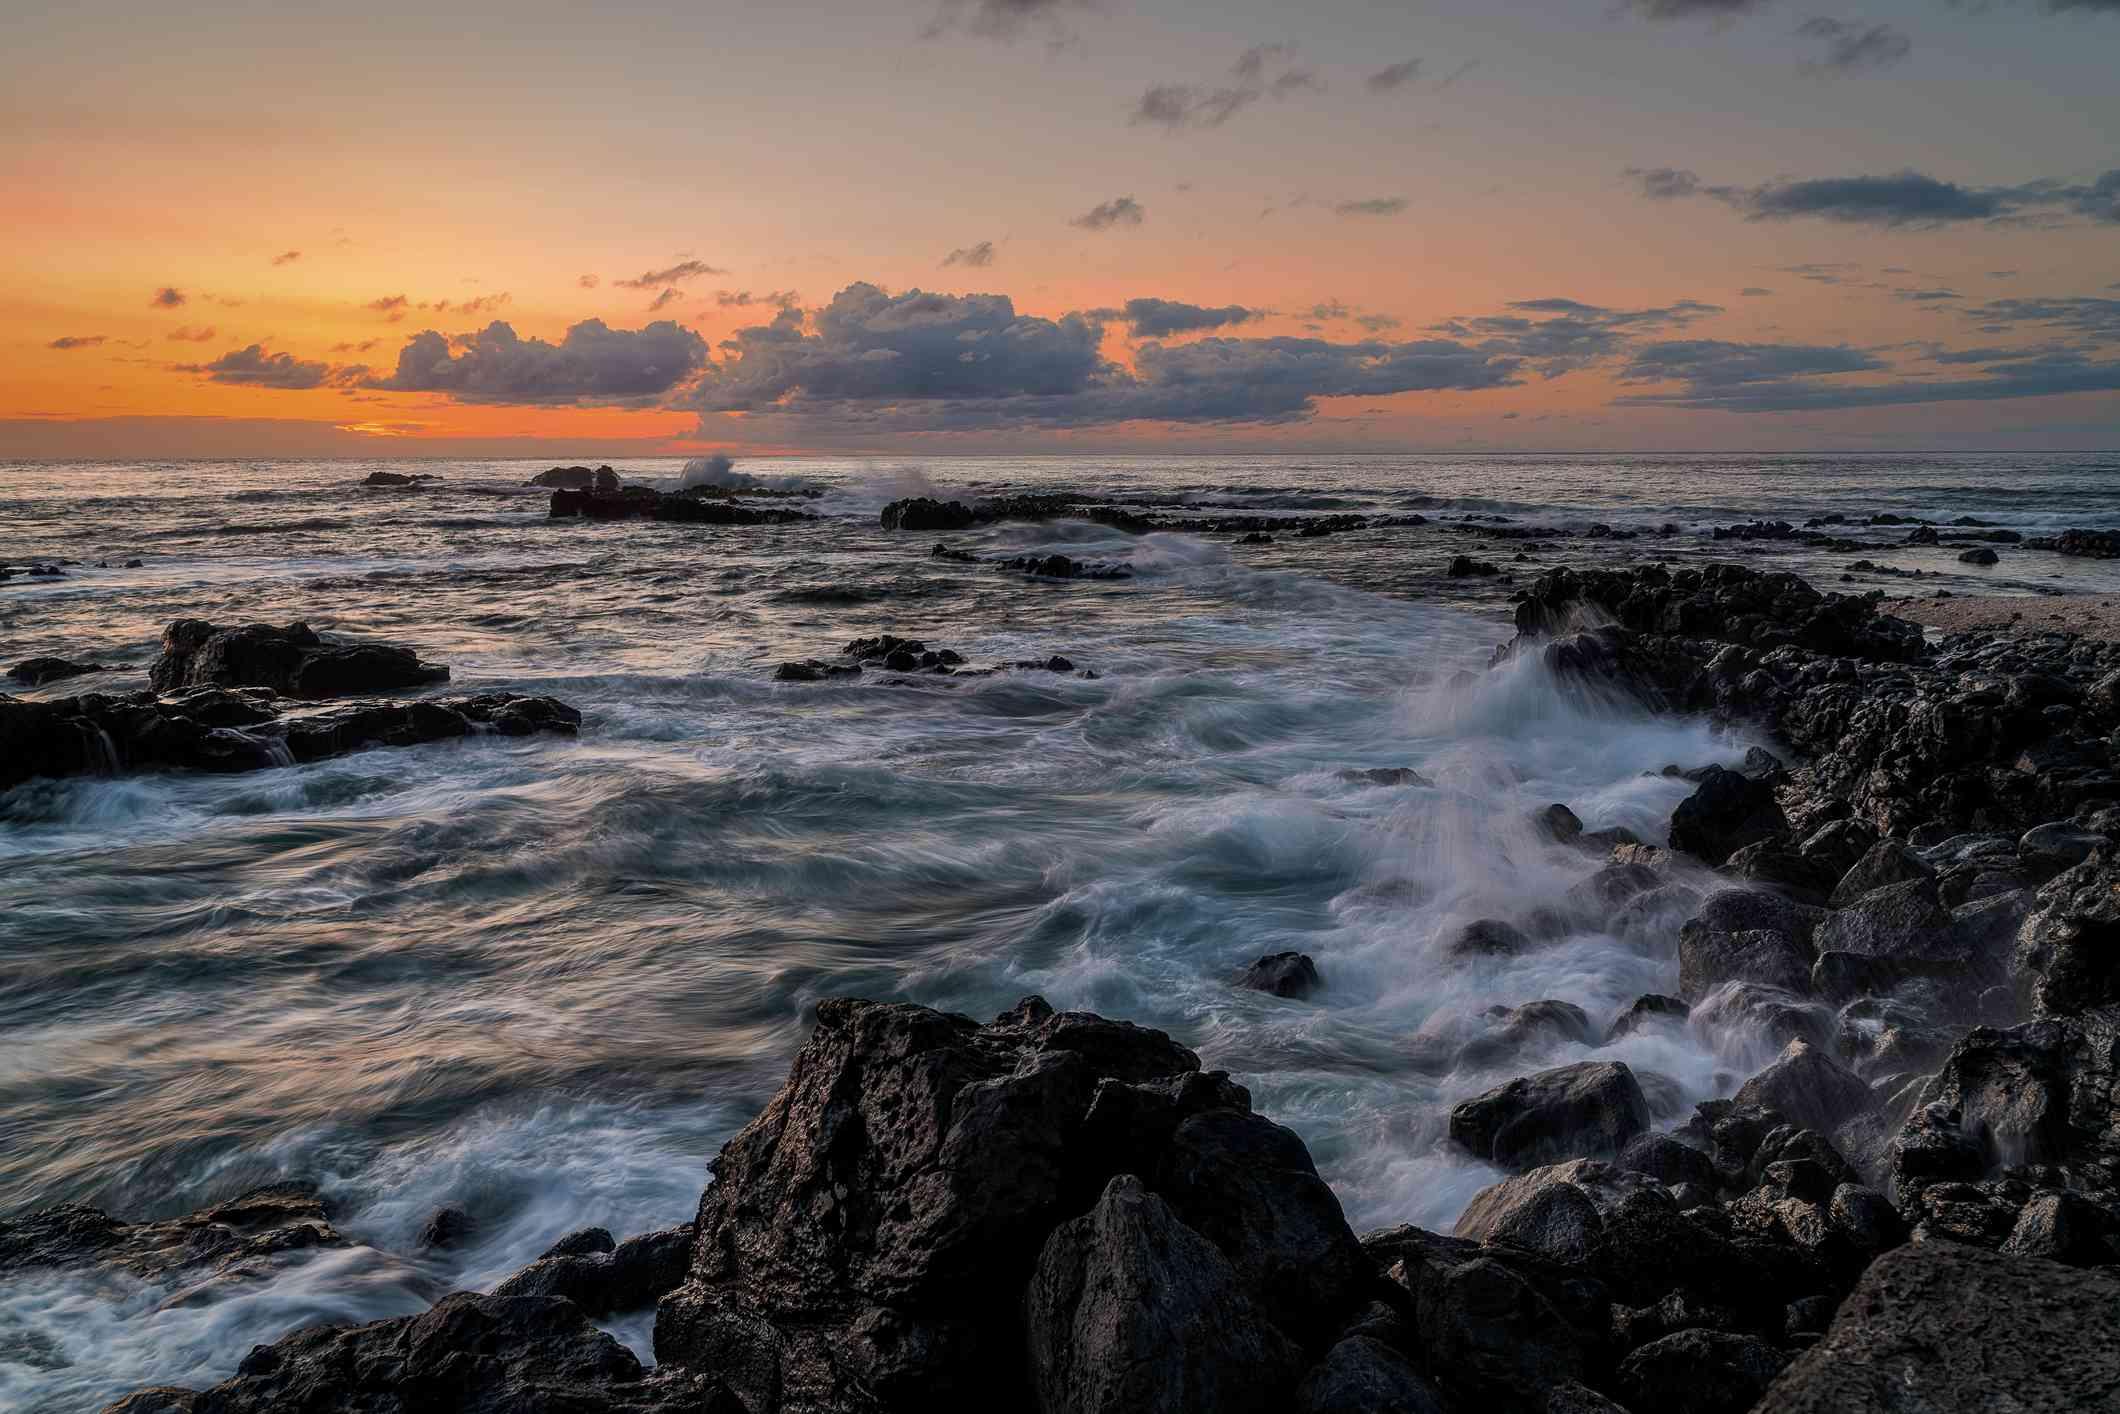 Sunset at Kaena Point on Oahu, Hawaii